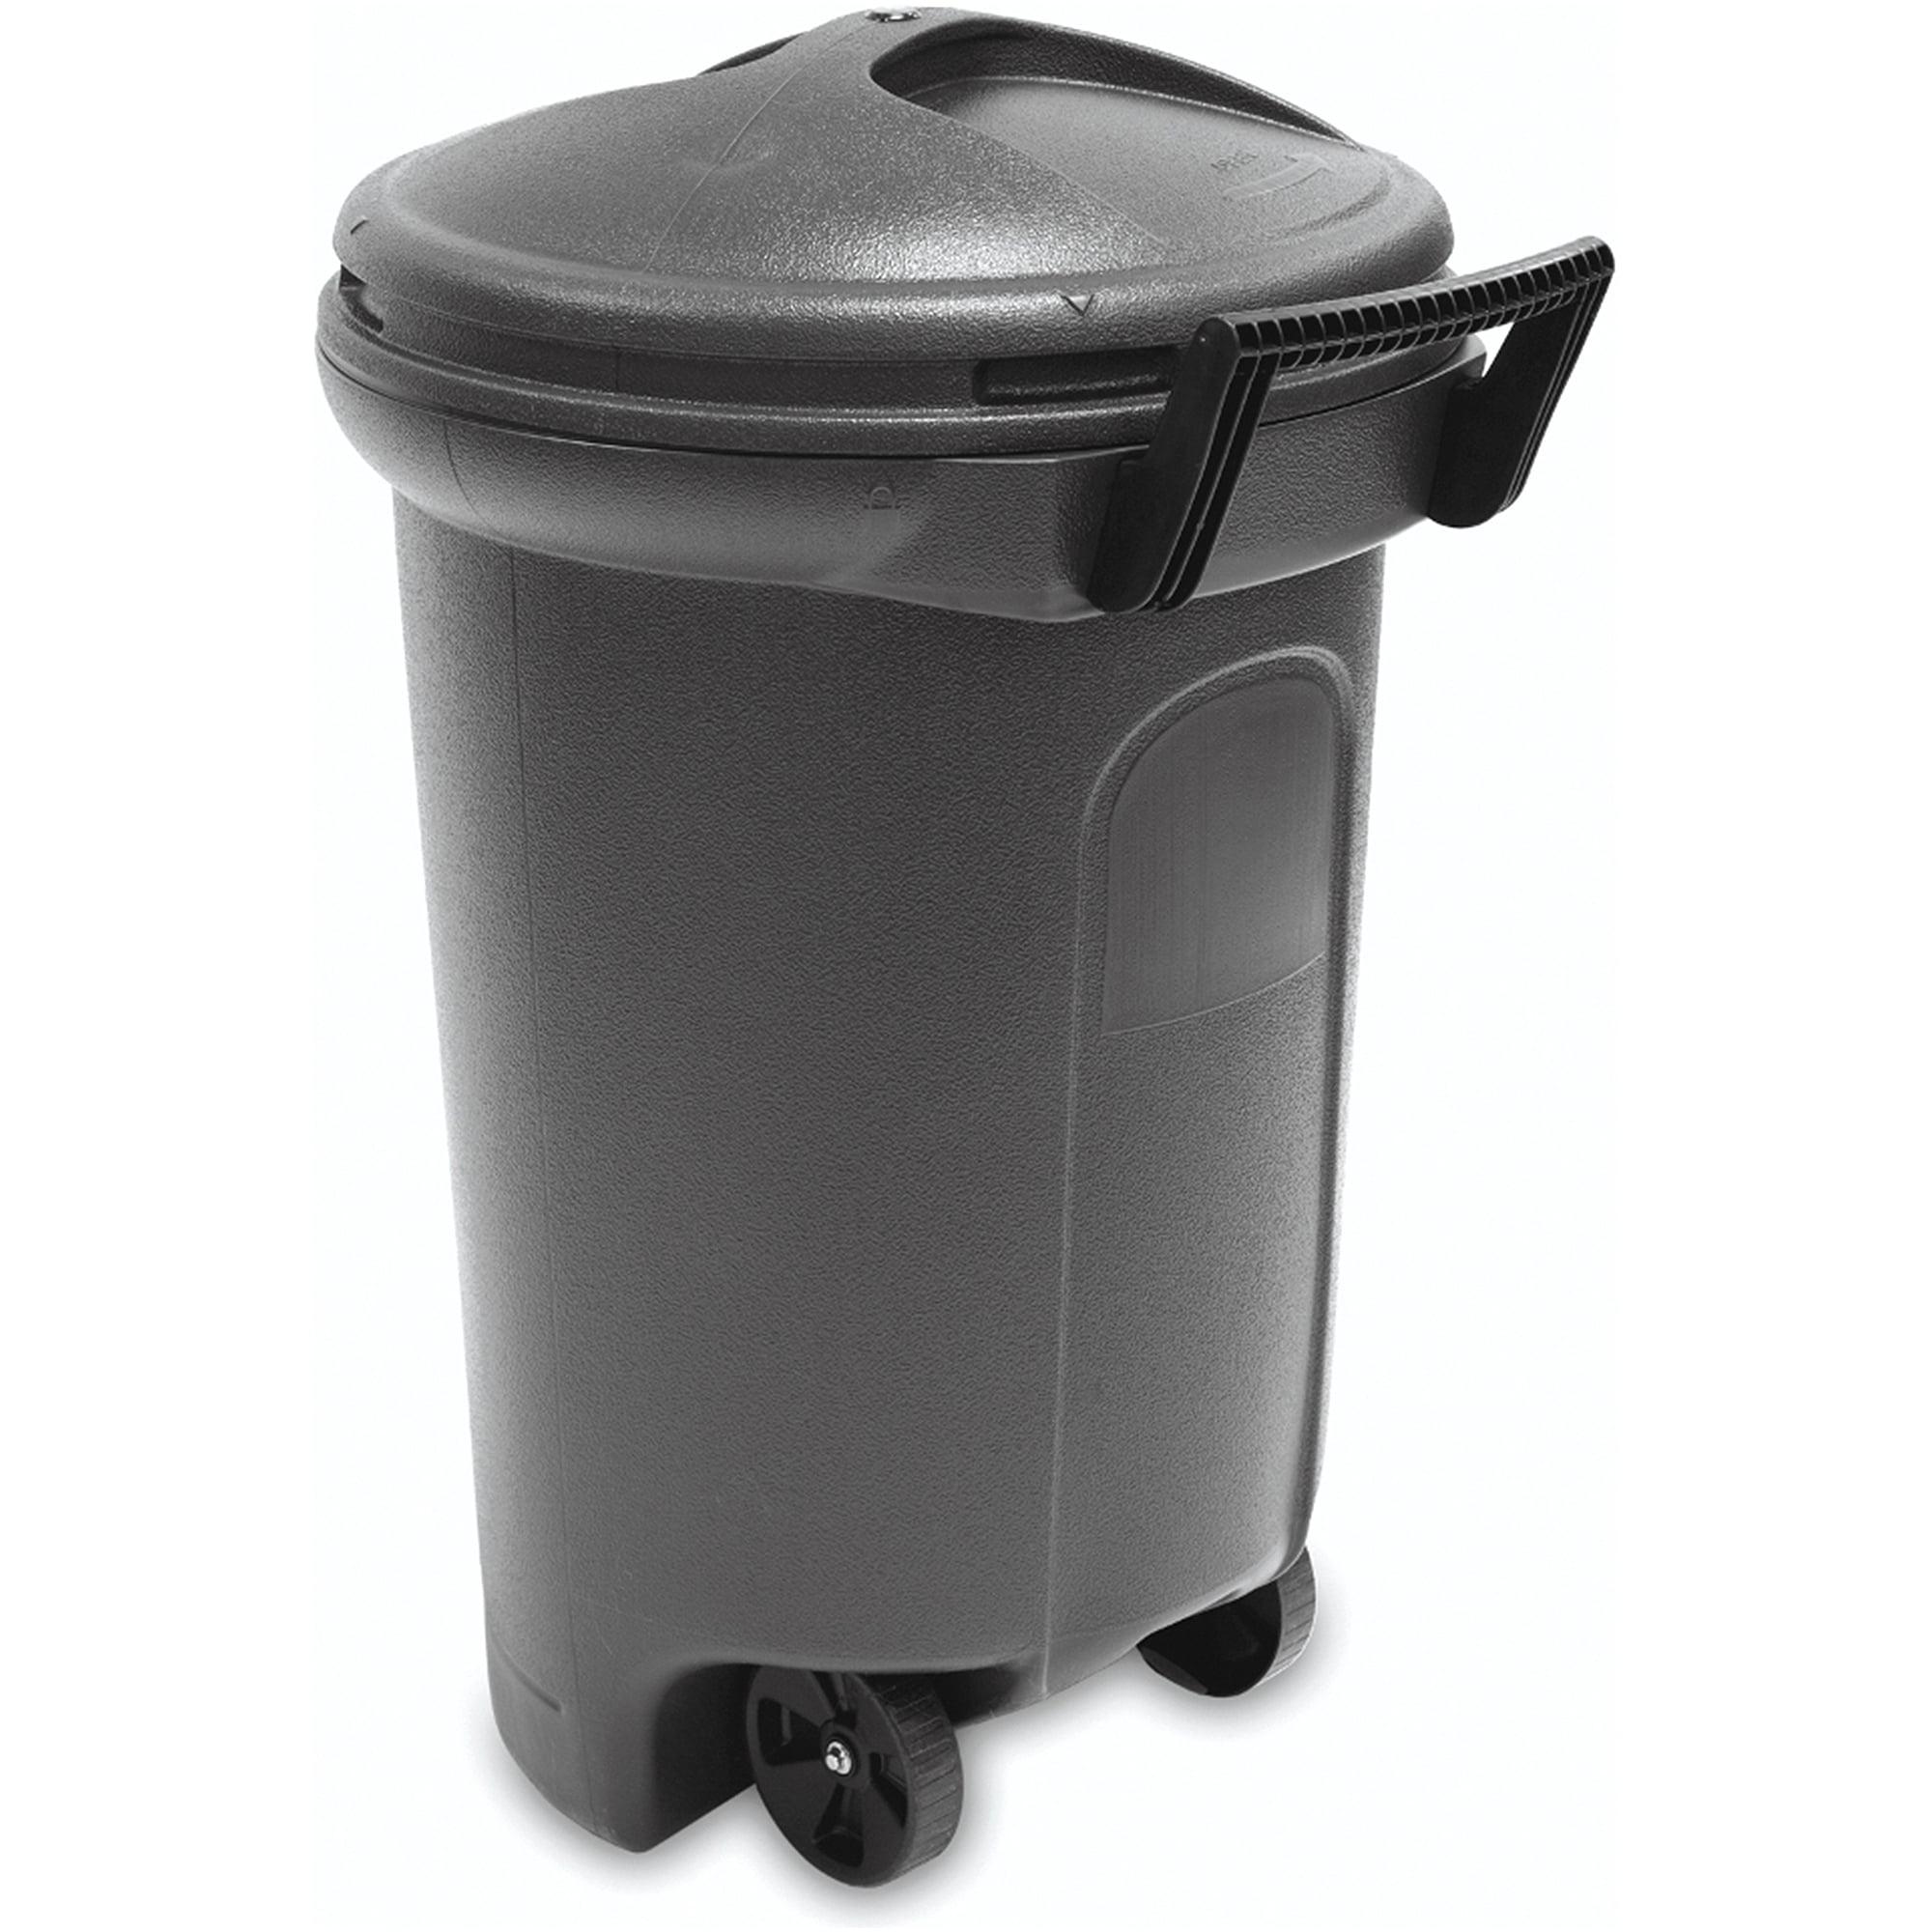 Trashmaster 32 Gallon Trash Can With Wheels Walmart Com